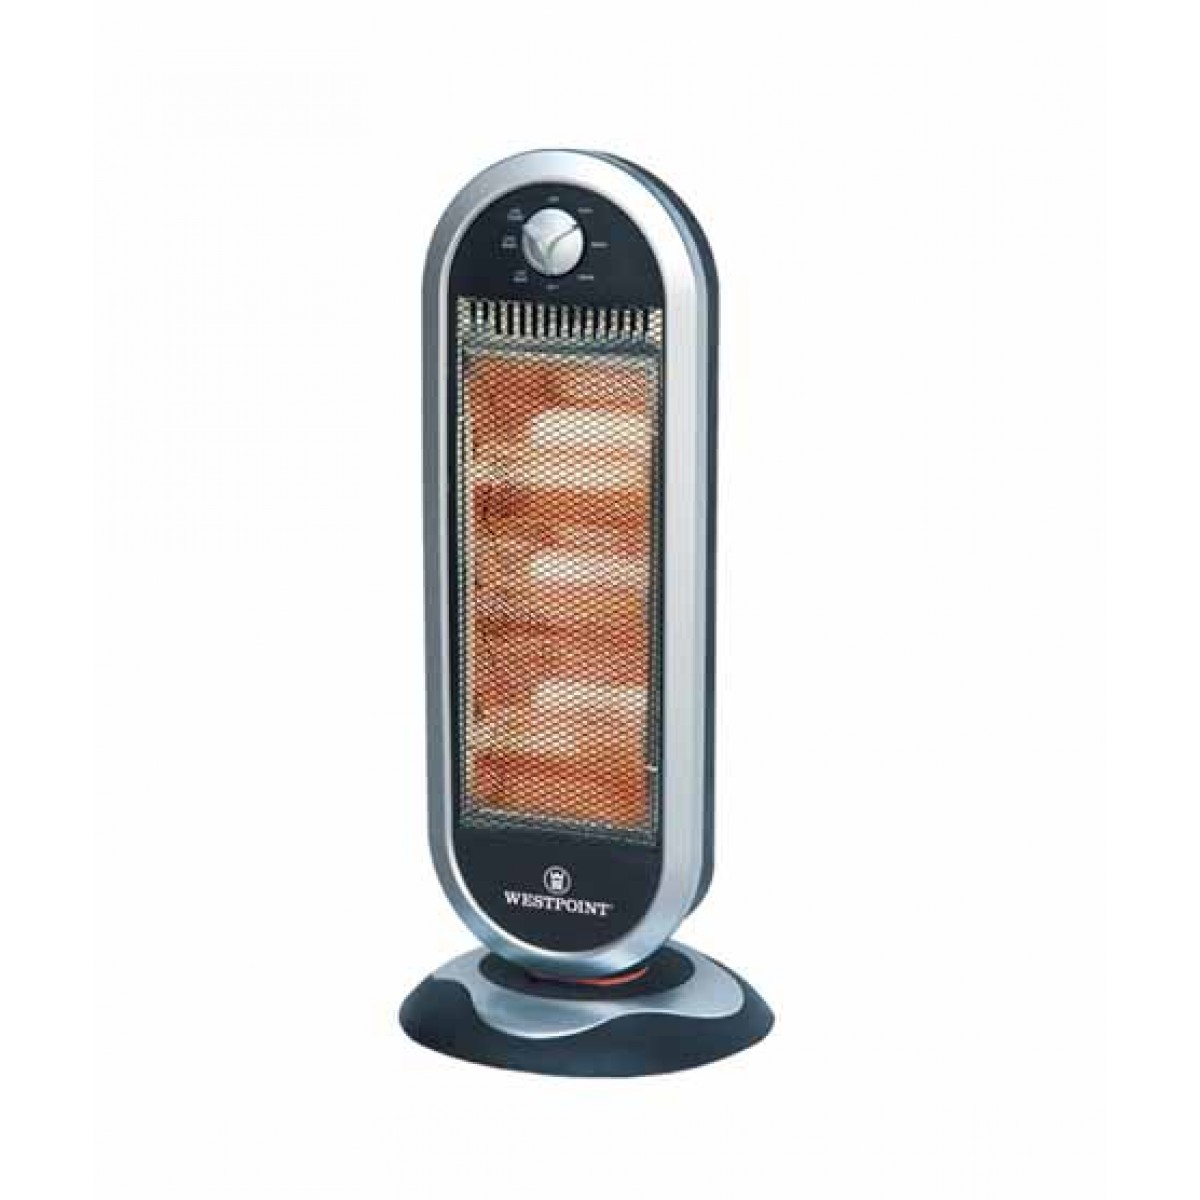 Image result for WestPoint Halogen Heater WF-5308